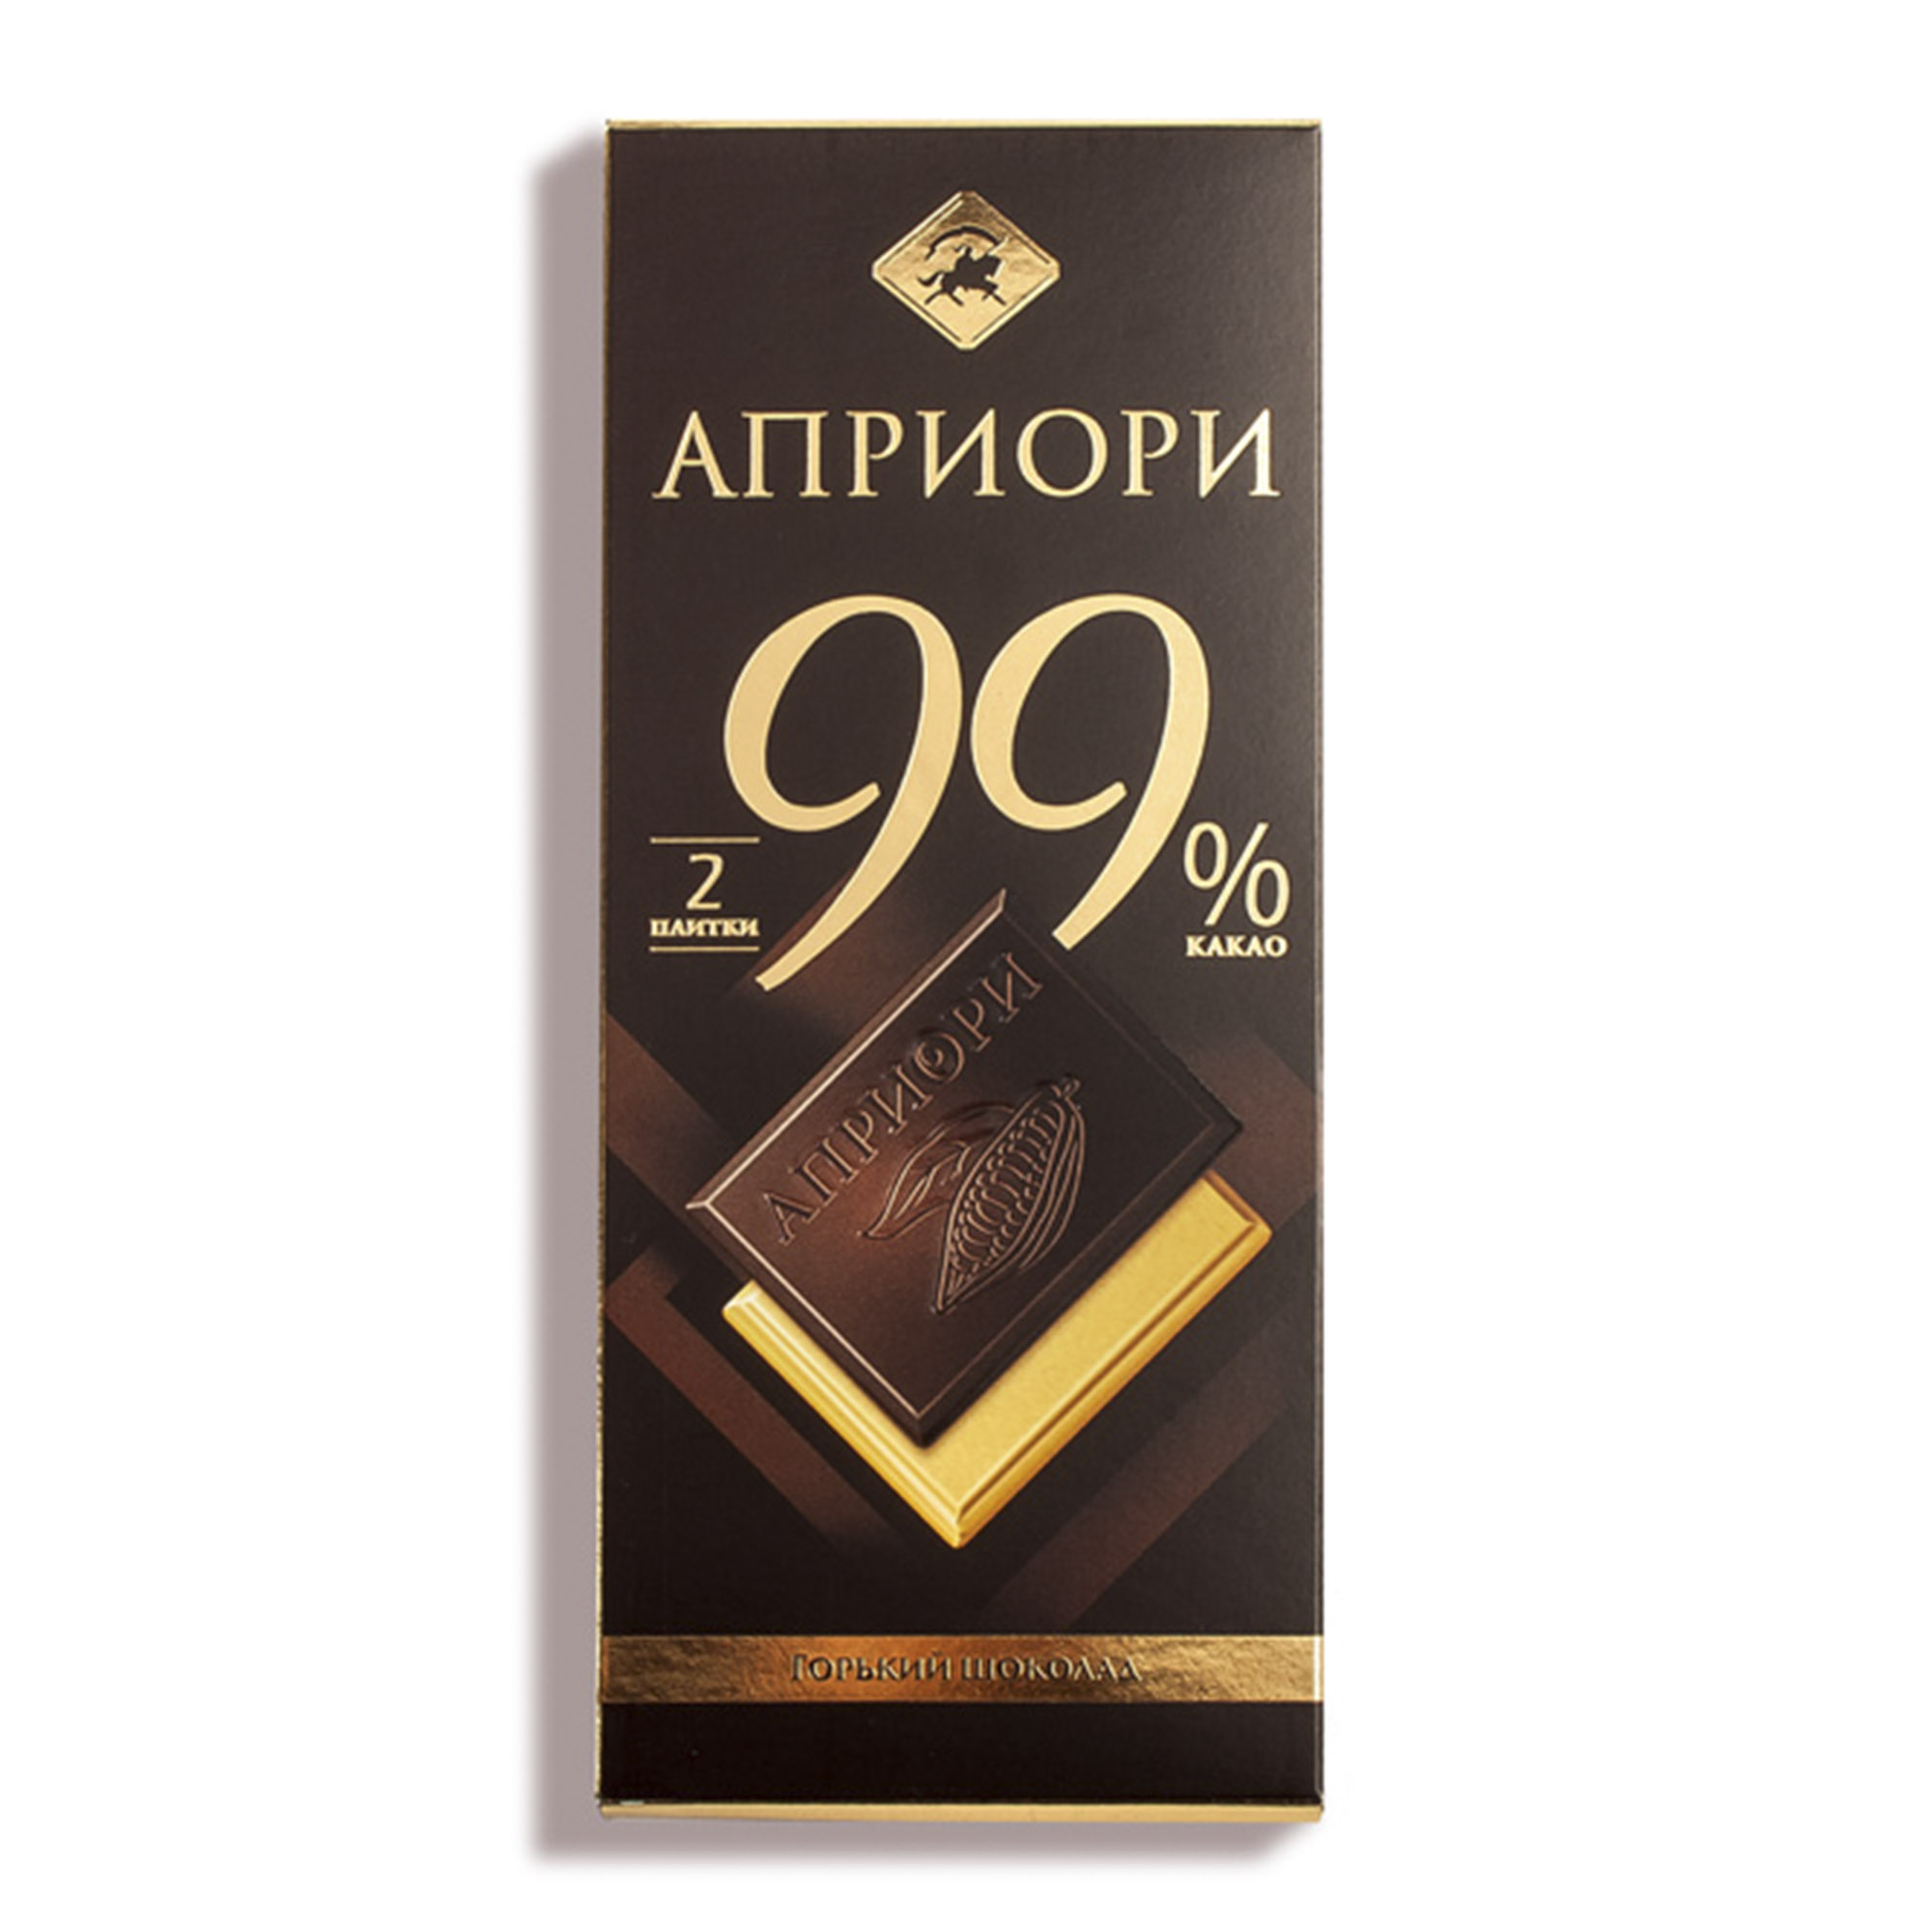 шоколад villars 72% горький 100 г Шоколад Априори Горький 99% 72 г